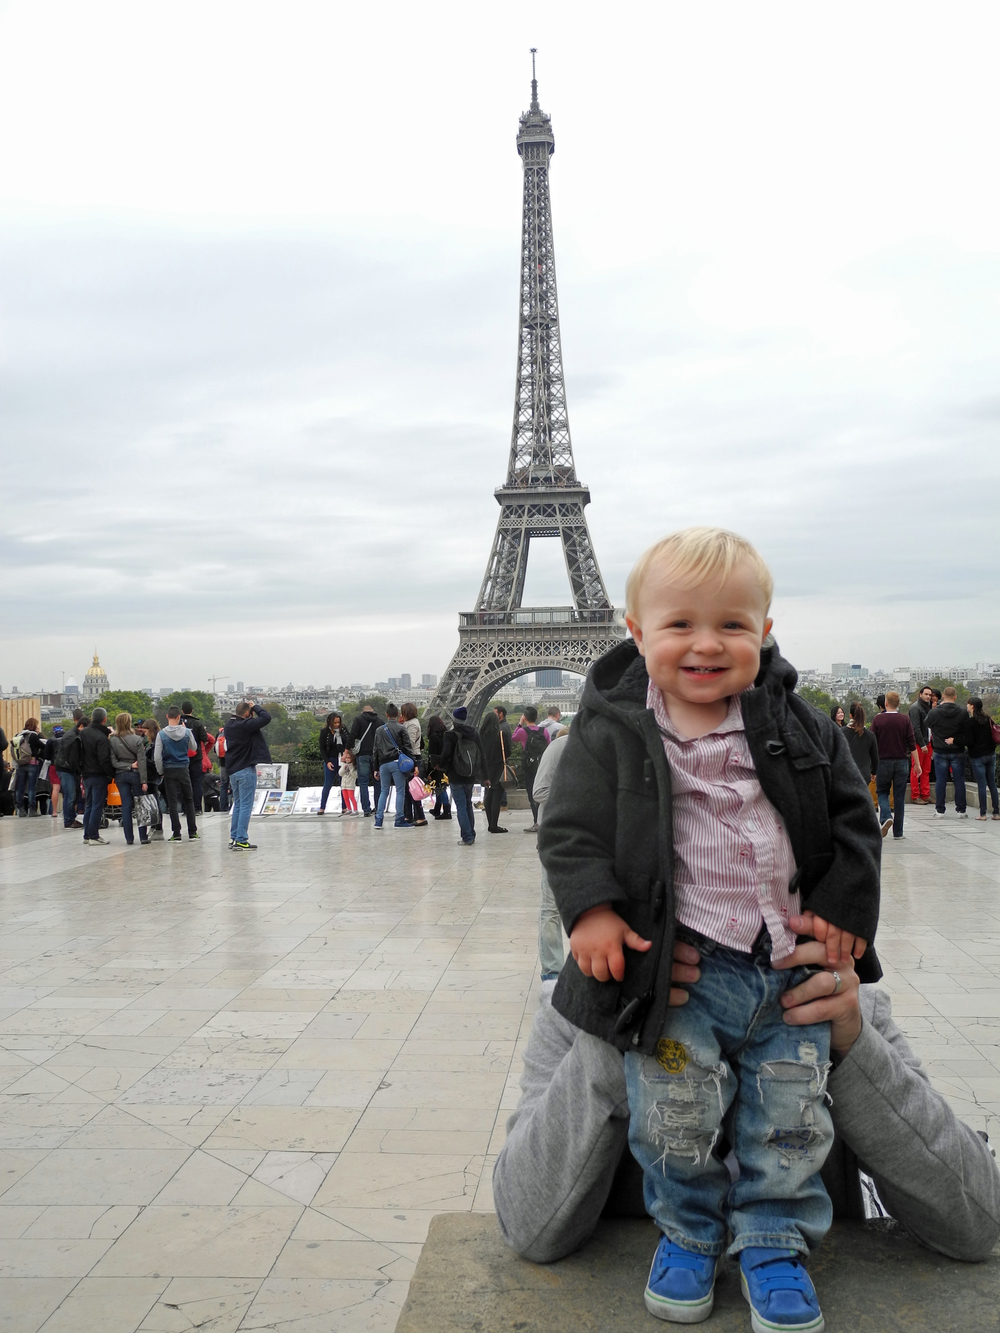 The best Eiffel Tower souvenir!